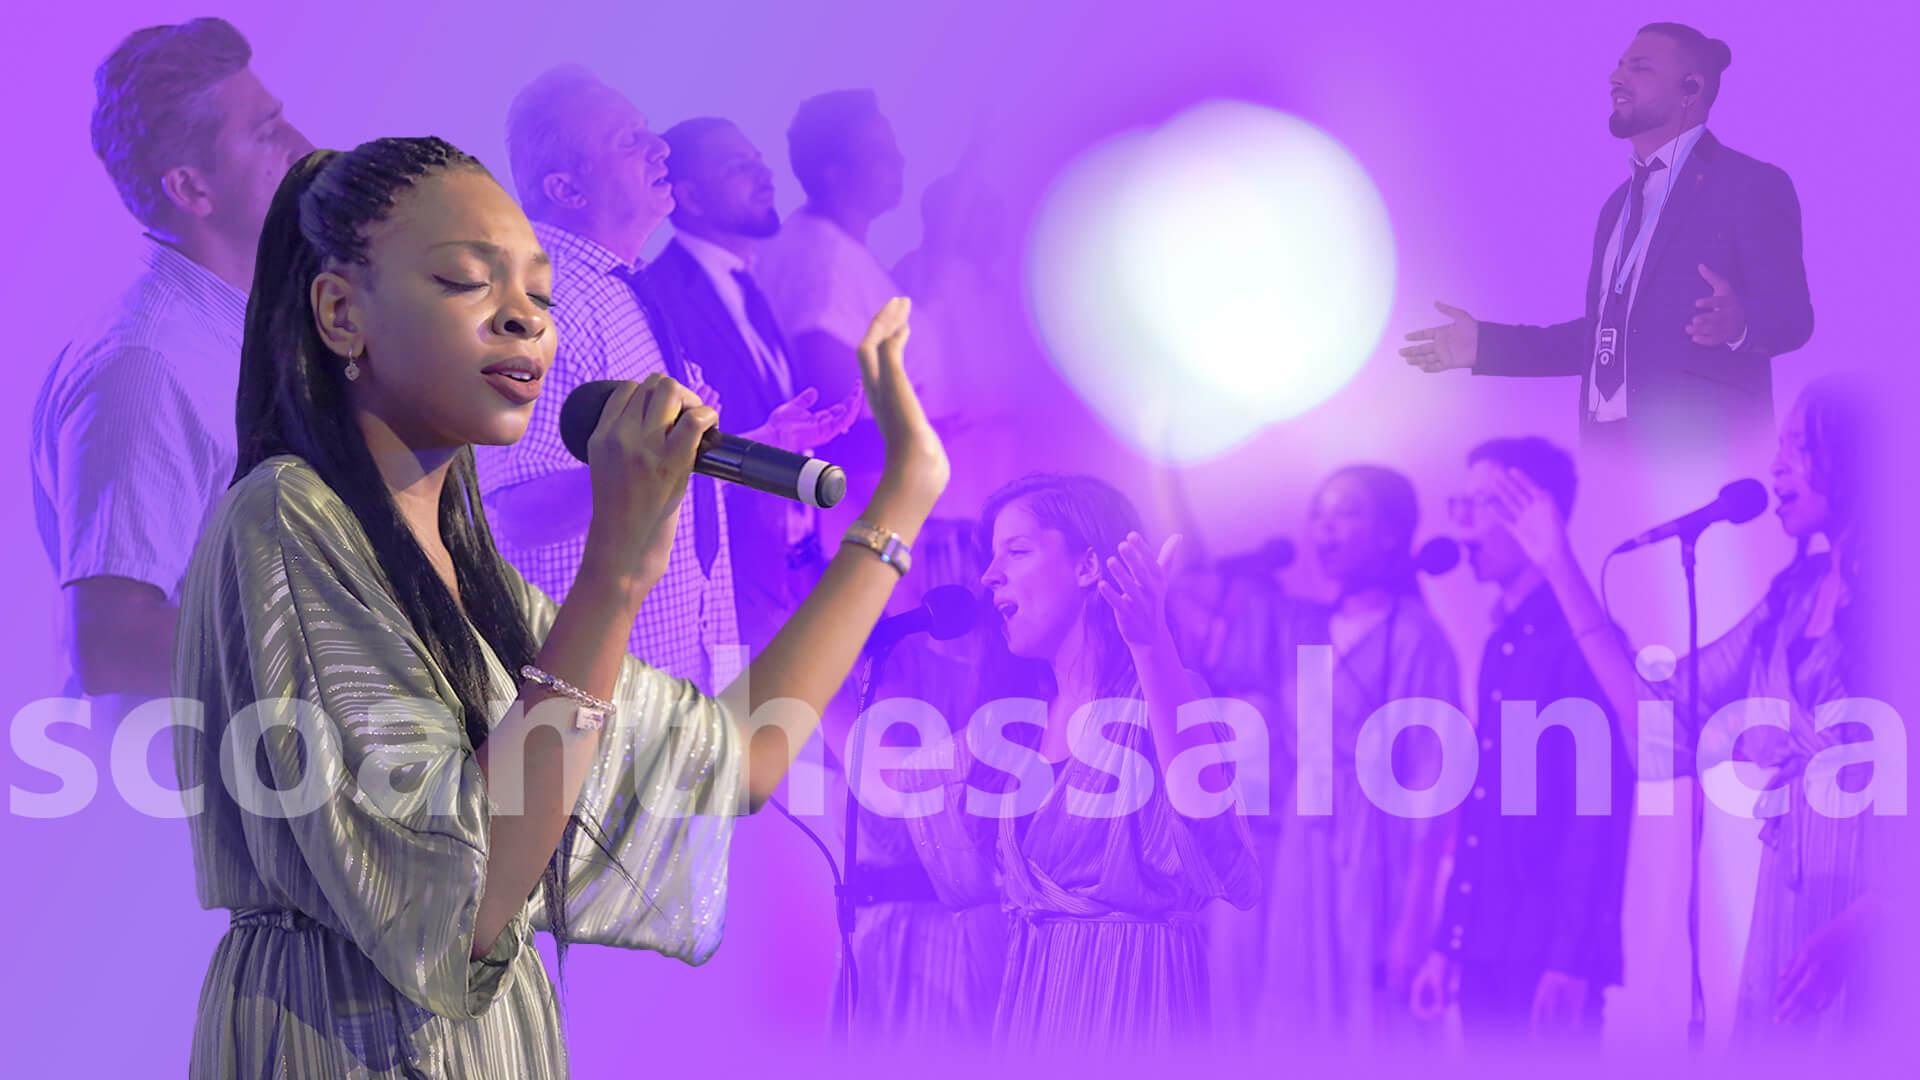 SCOAN_THESSALONICA_WORSHIP_2020_07_26